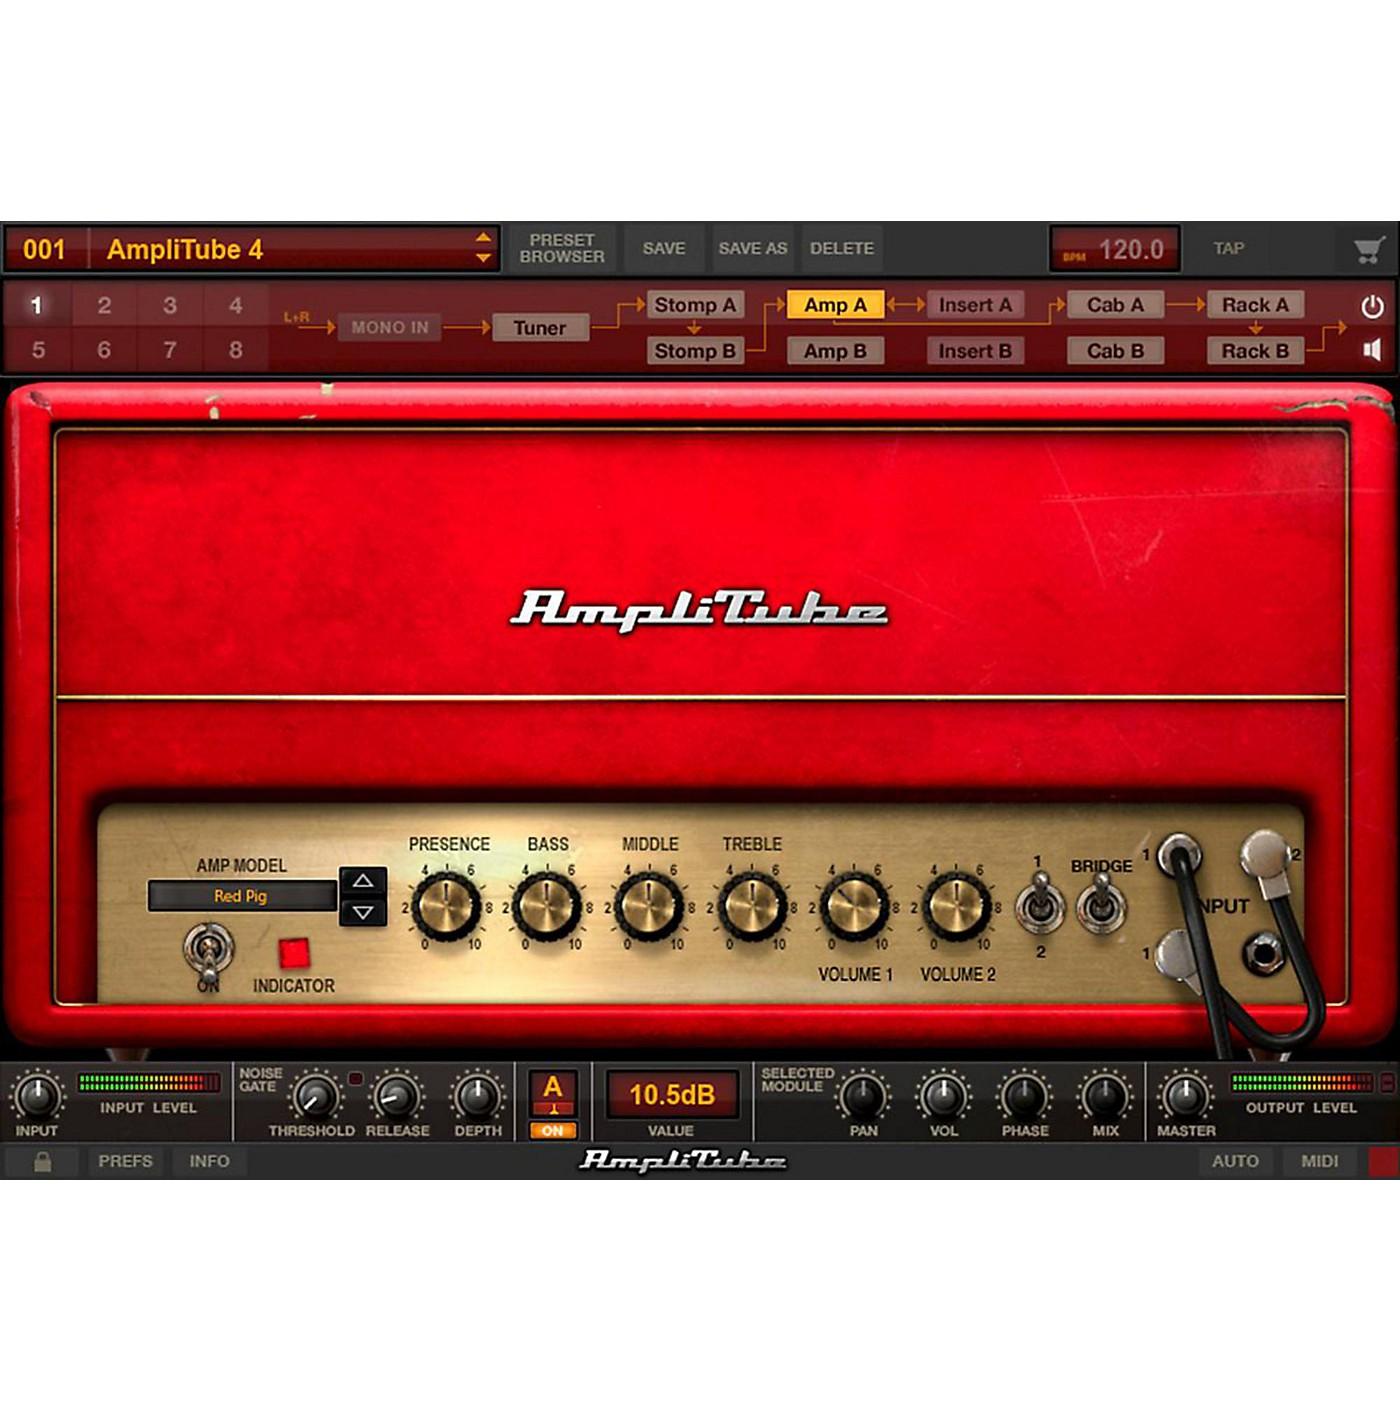 IK Multimedia AmpliTube 4 thumbnail